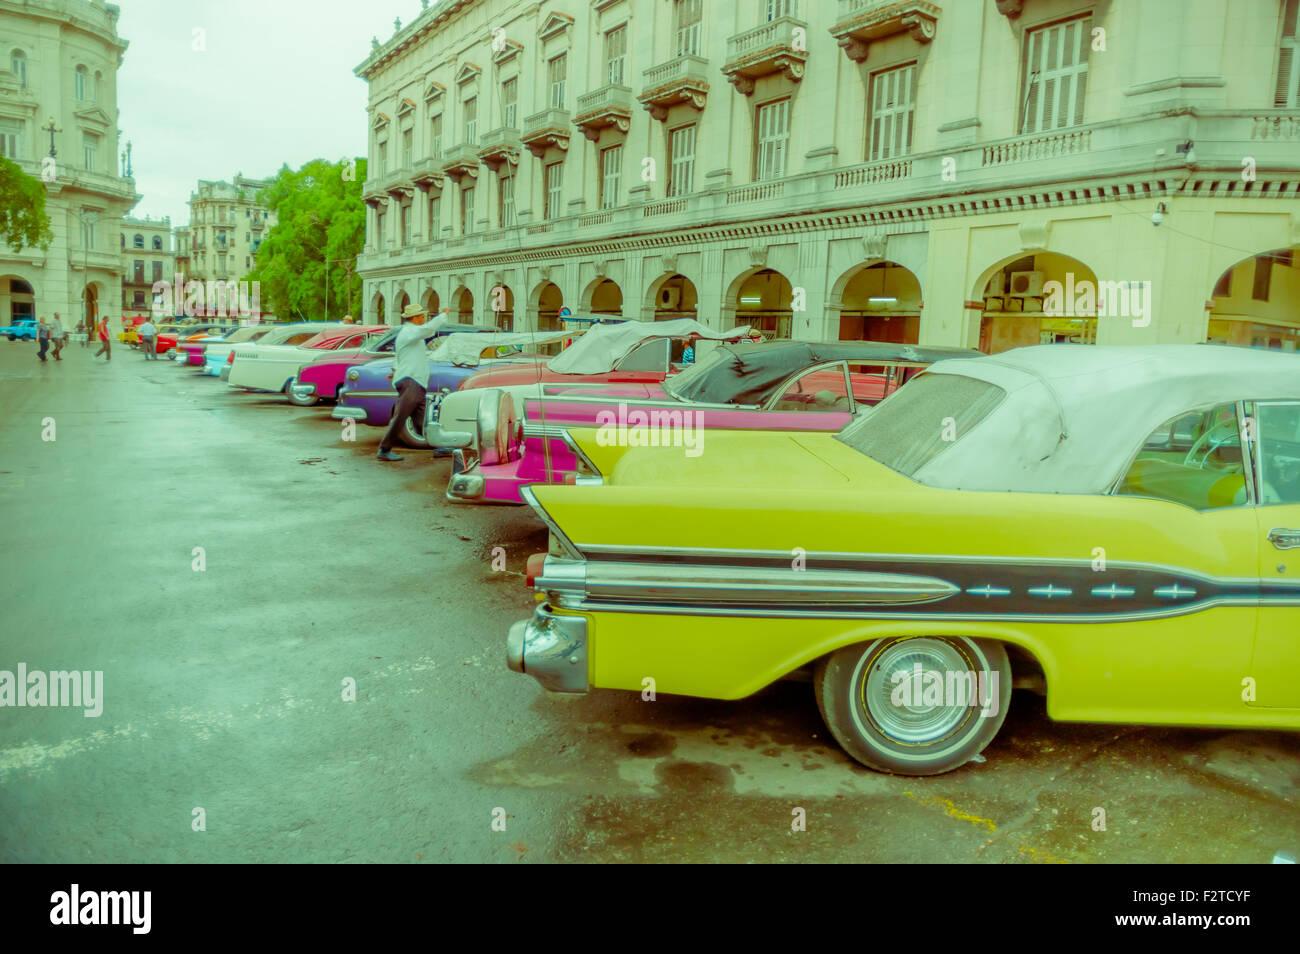 HAVANA, CUBA - DECEMBER 2, 2013: Old classic American cars rides in ...